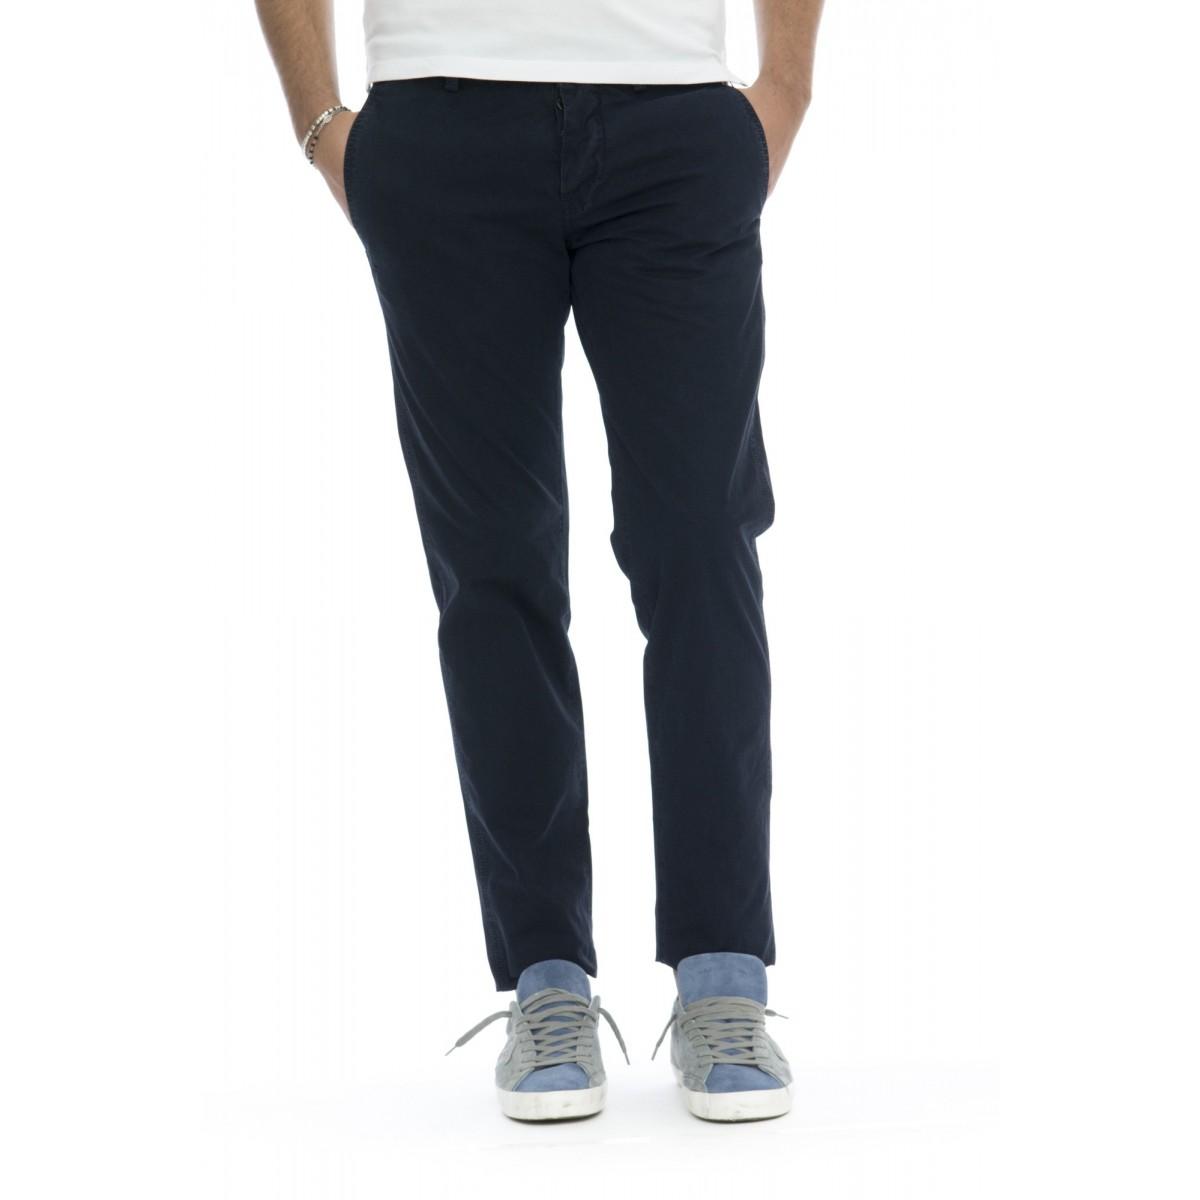 Jeans - 302wn slim strech